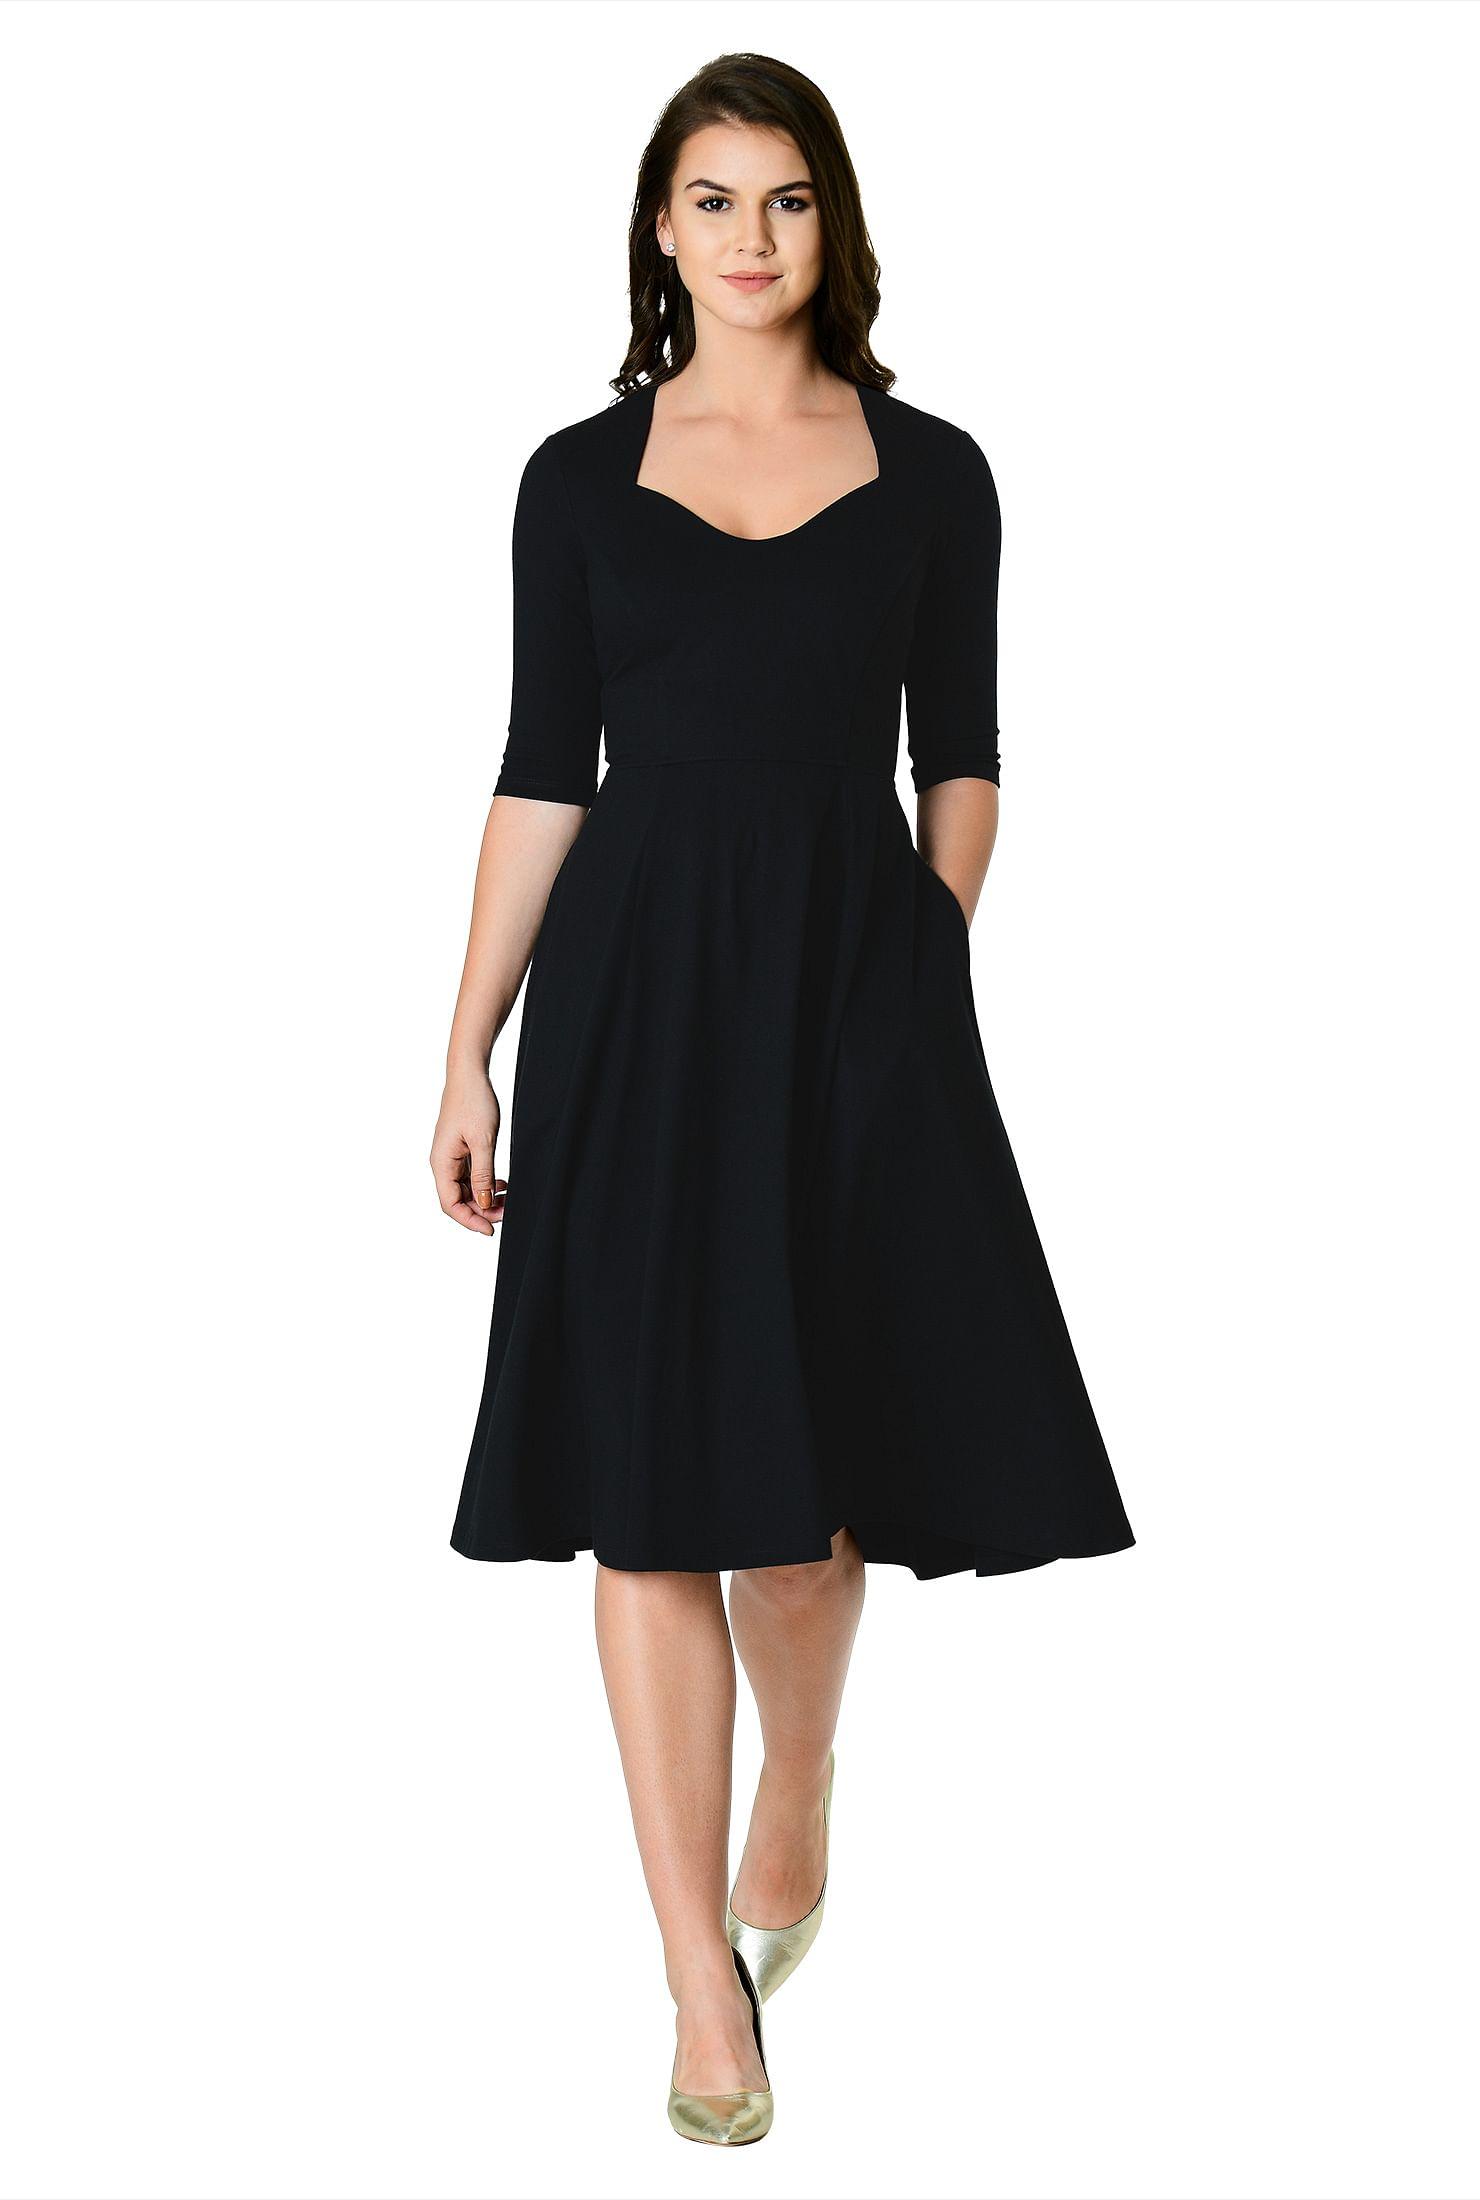 b28f60a7d64350 below knee length dresses, black dresses, cotton/spandex Dresses, day  dresses